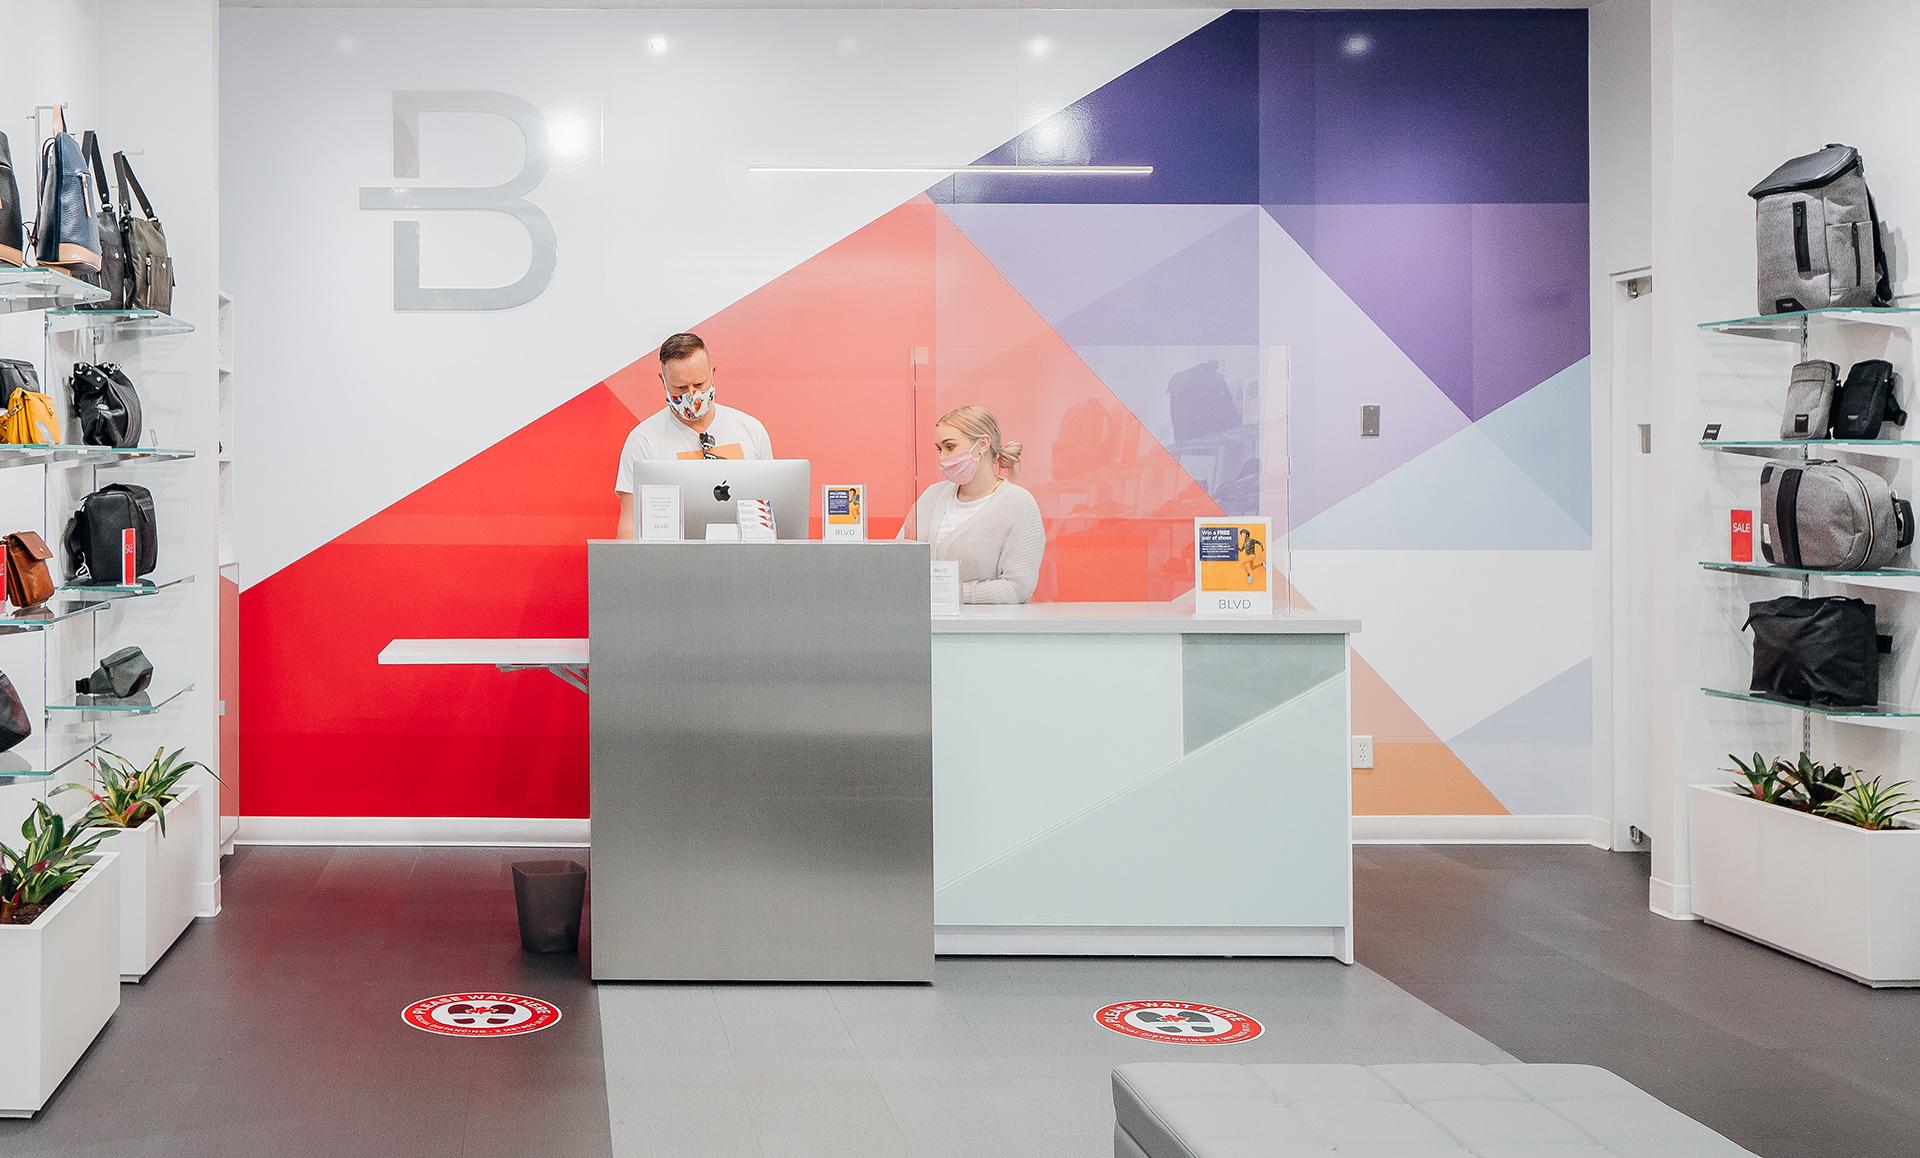 retail shoe store marketing front desk employees